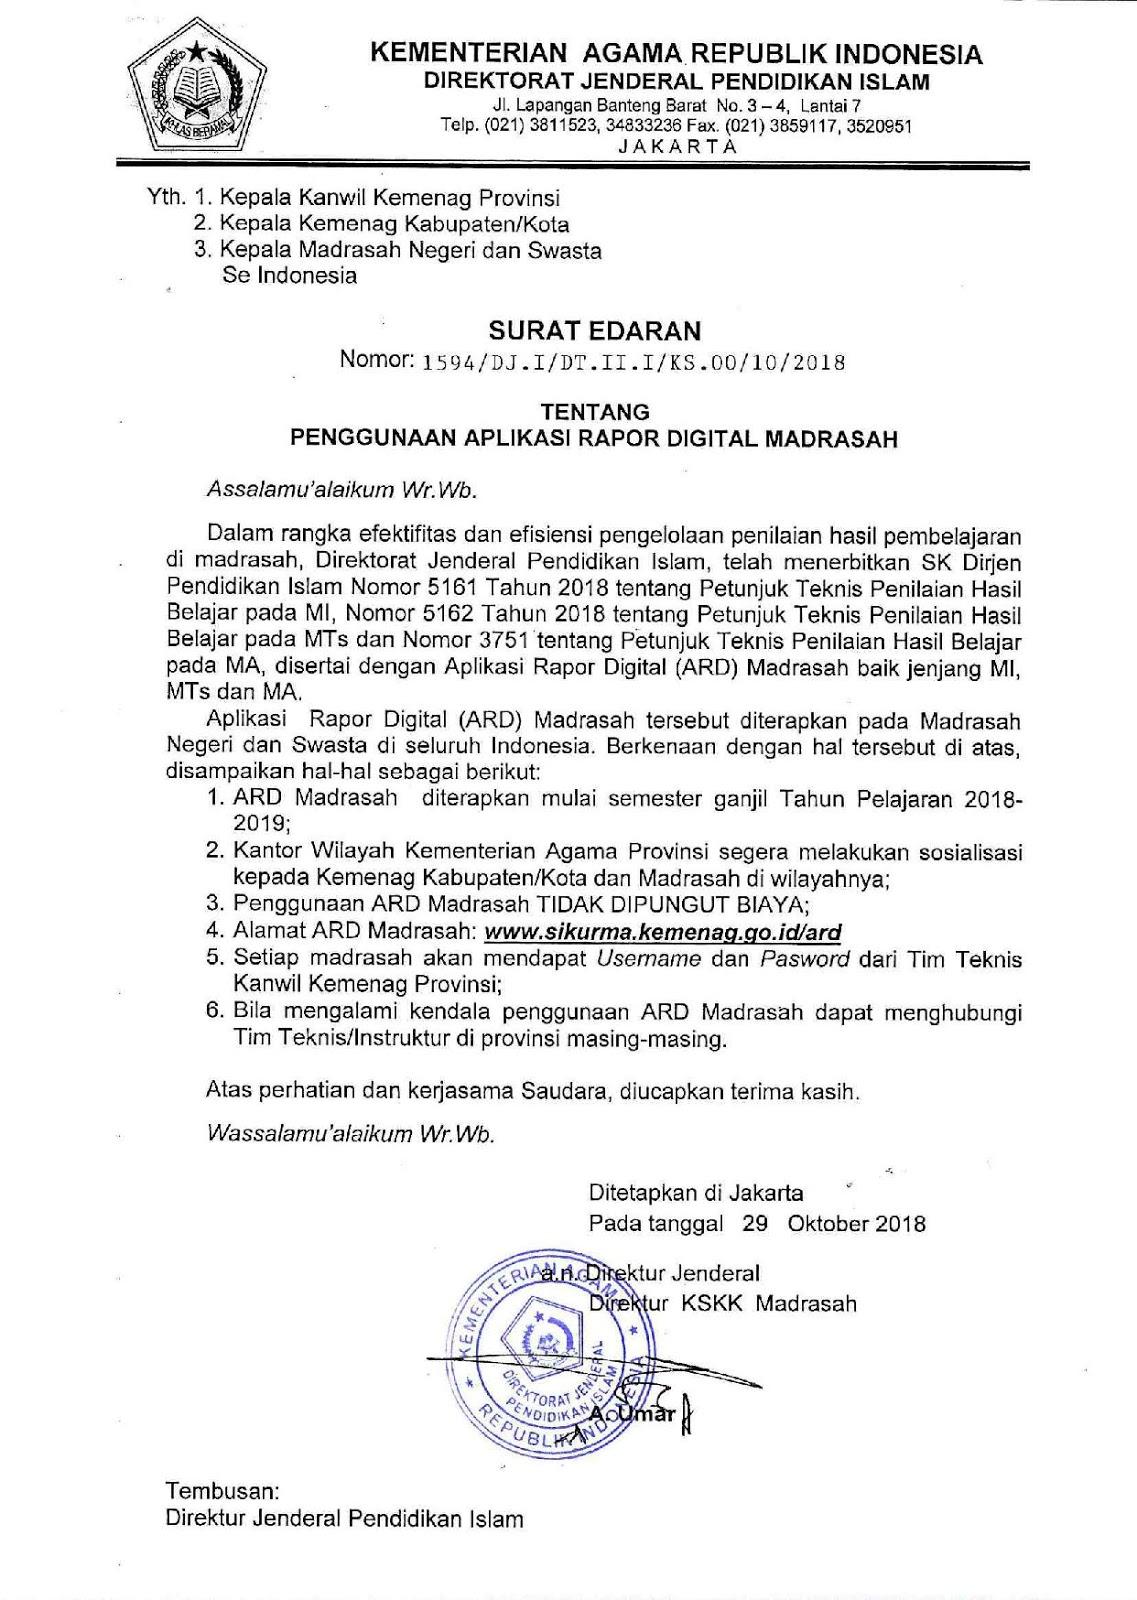 Surat Edaran Dirjen Pendis Tentang Penggunaan Aplikasi Raport Digital Madrasah (Rapor Online)